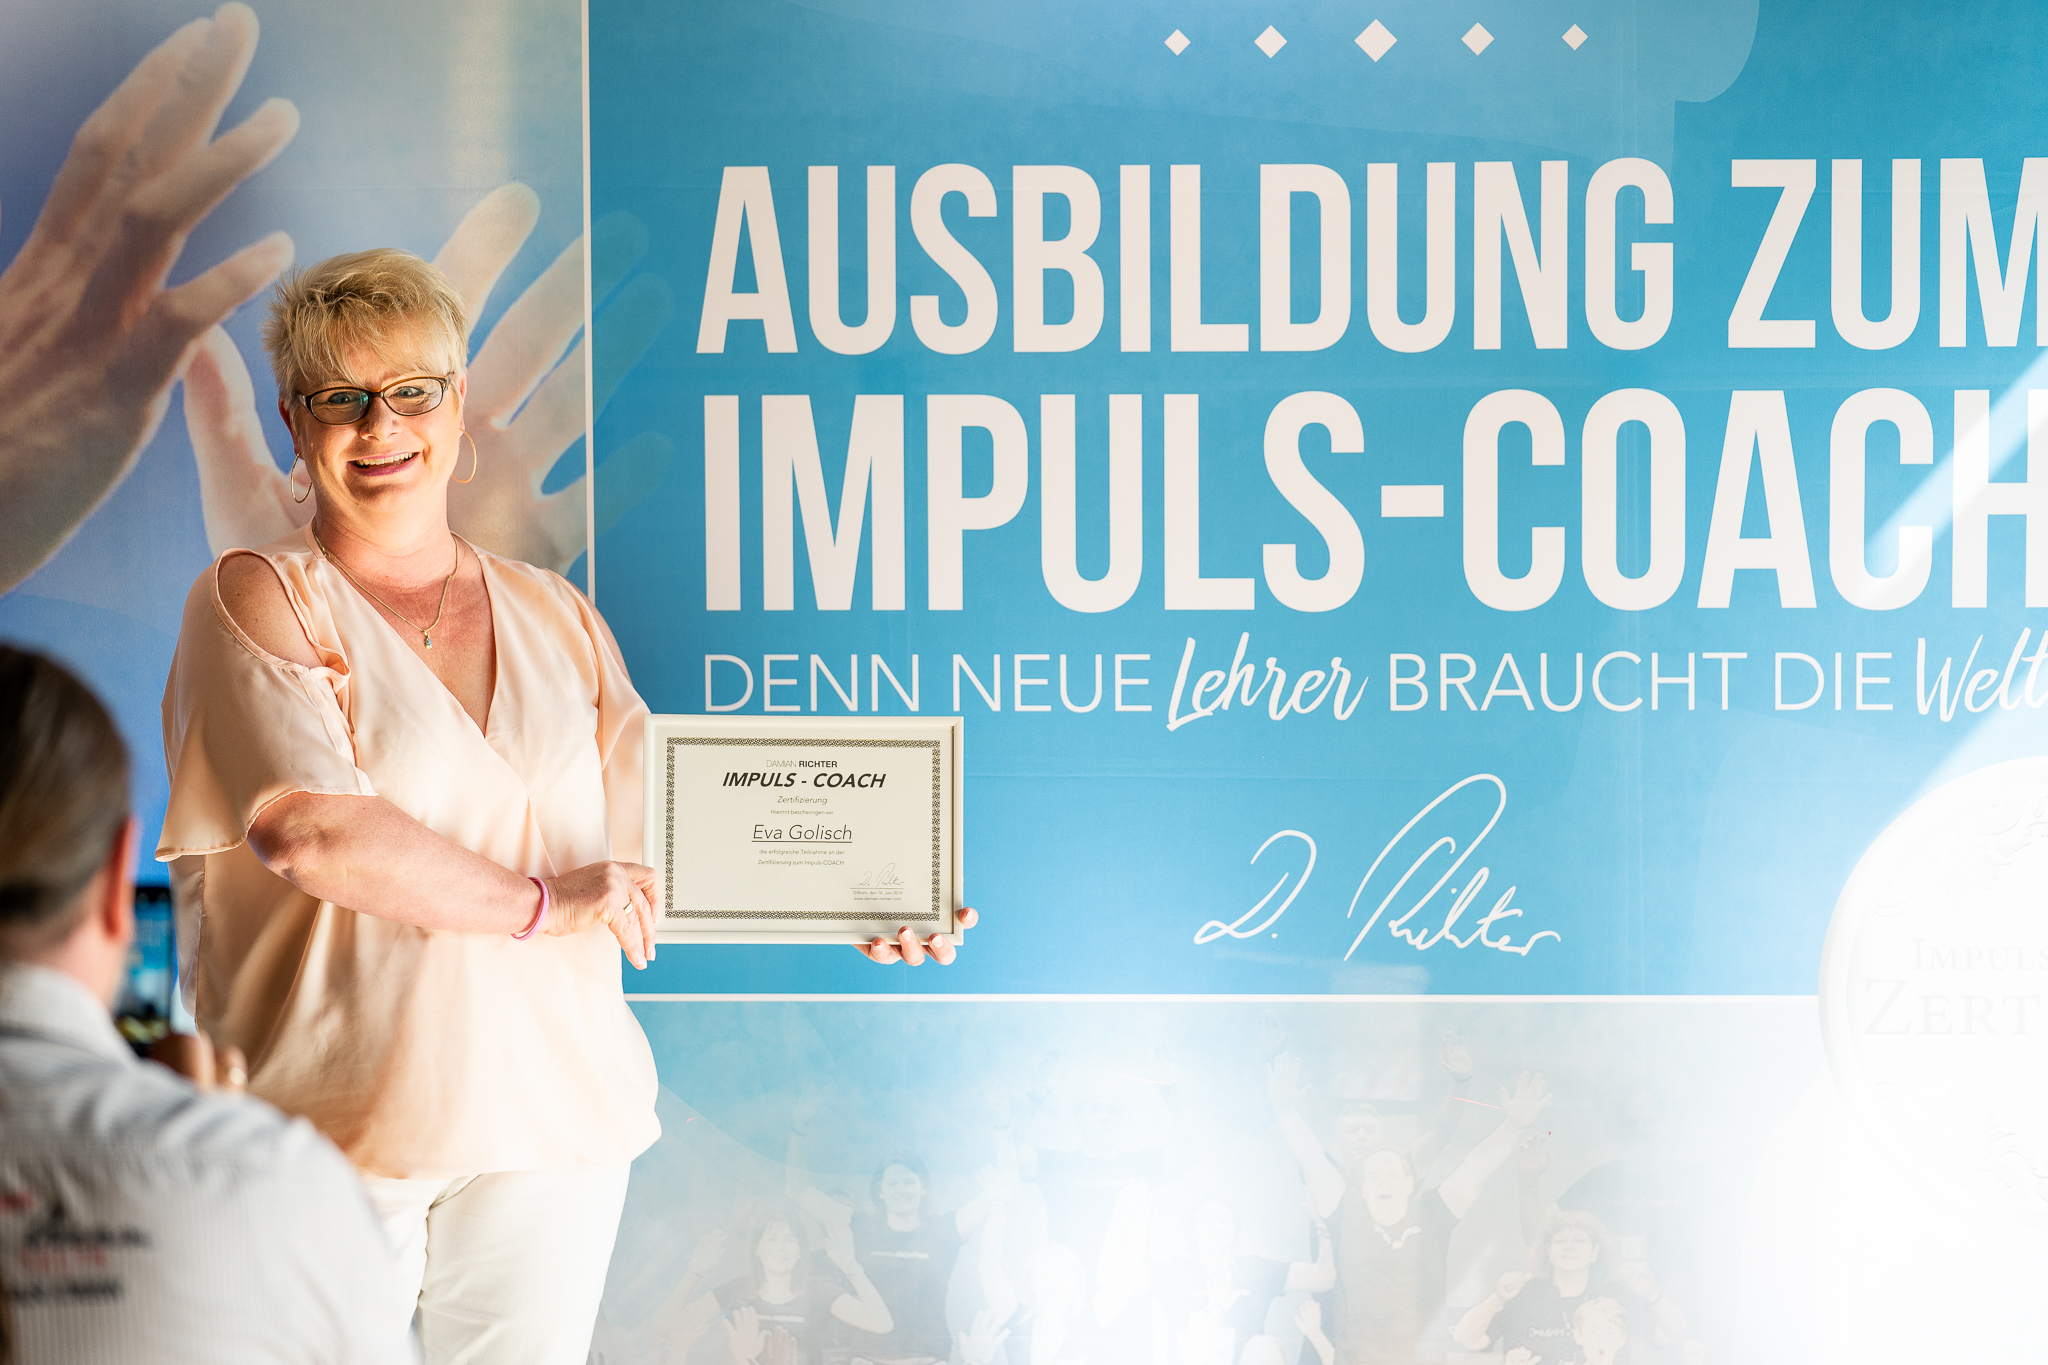 Teilnehmerin mit Impuls-Coach-Zertifikat